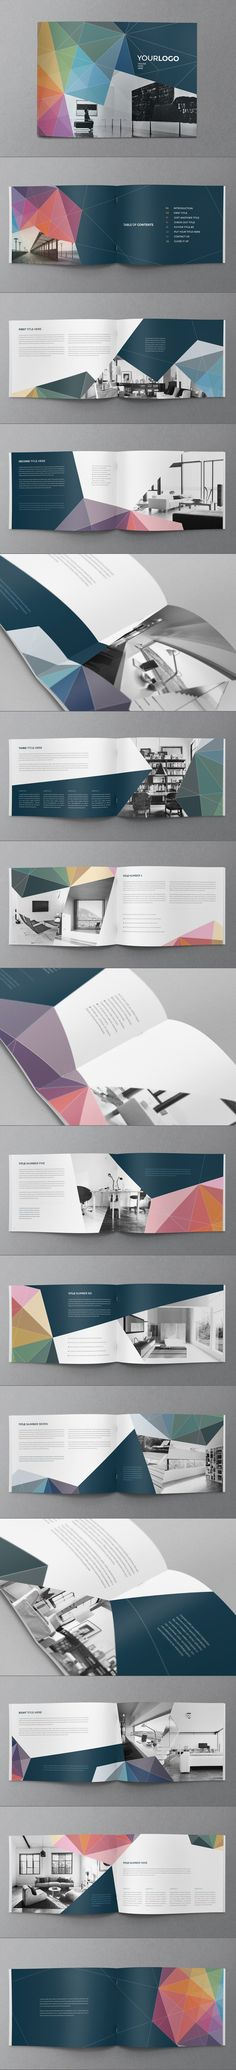 Multicolor Modern Brochure by Abra Design, via Behance